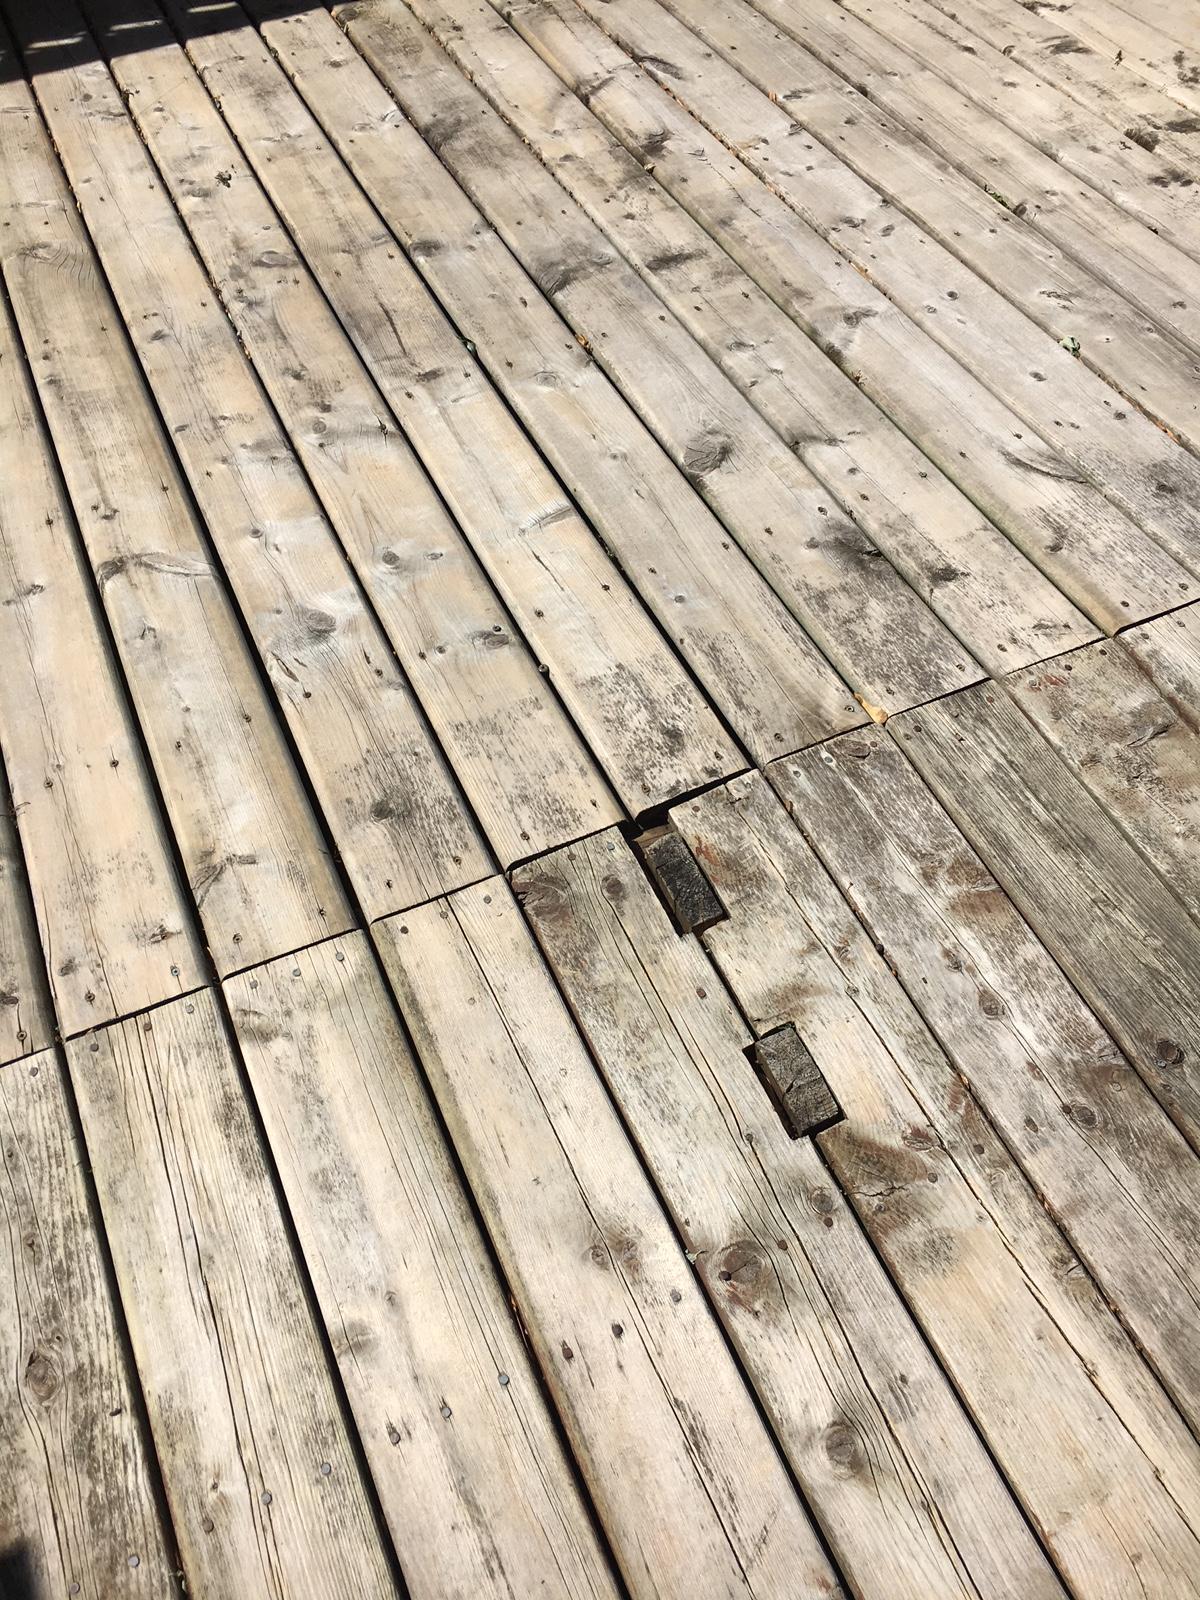 Black Spots Left On Deck After Cleaning